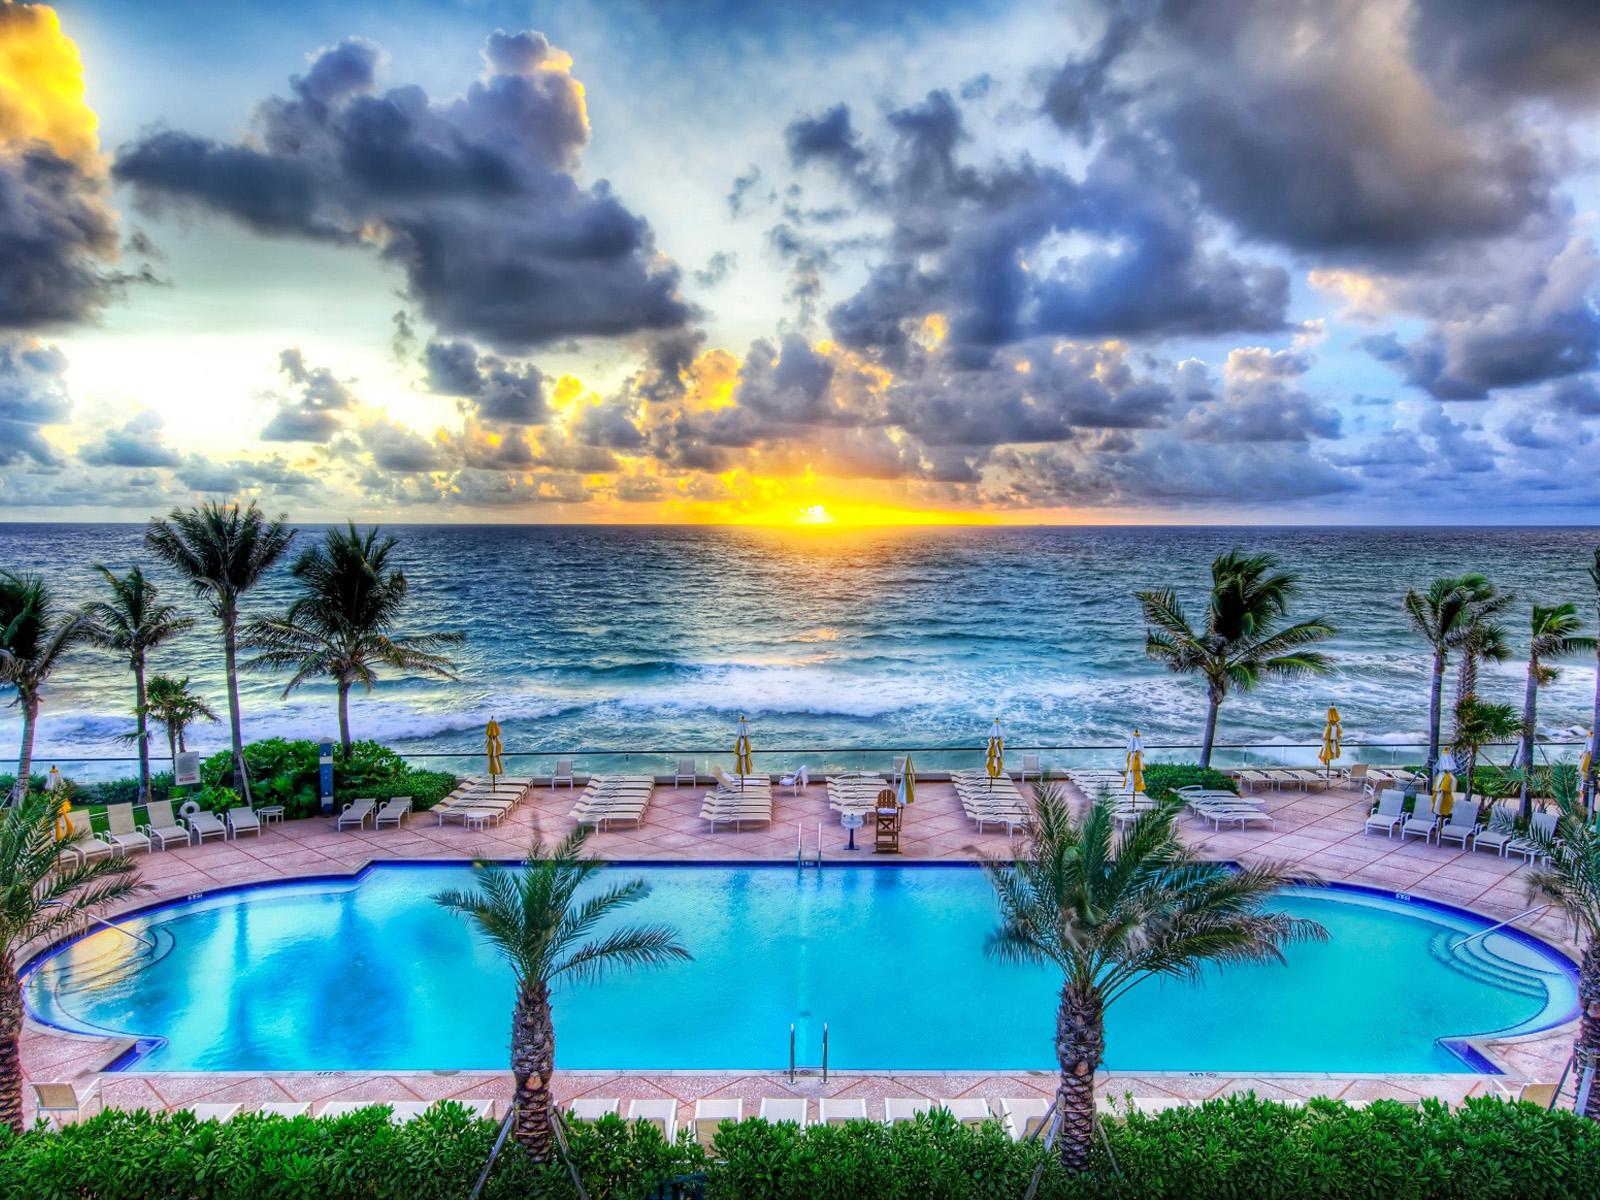 Pool Party Florida Wallpaper 1600X1200 HD Desktop Wallpapers 1600x1200